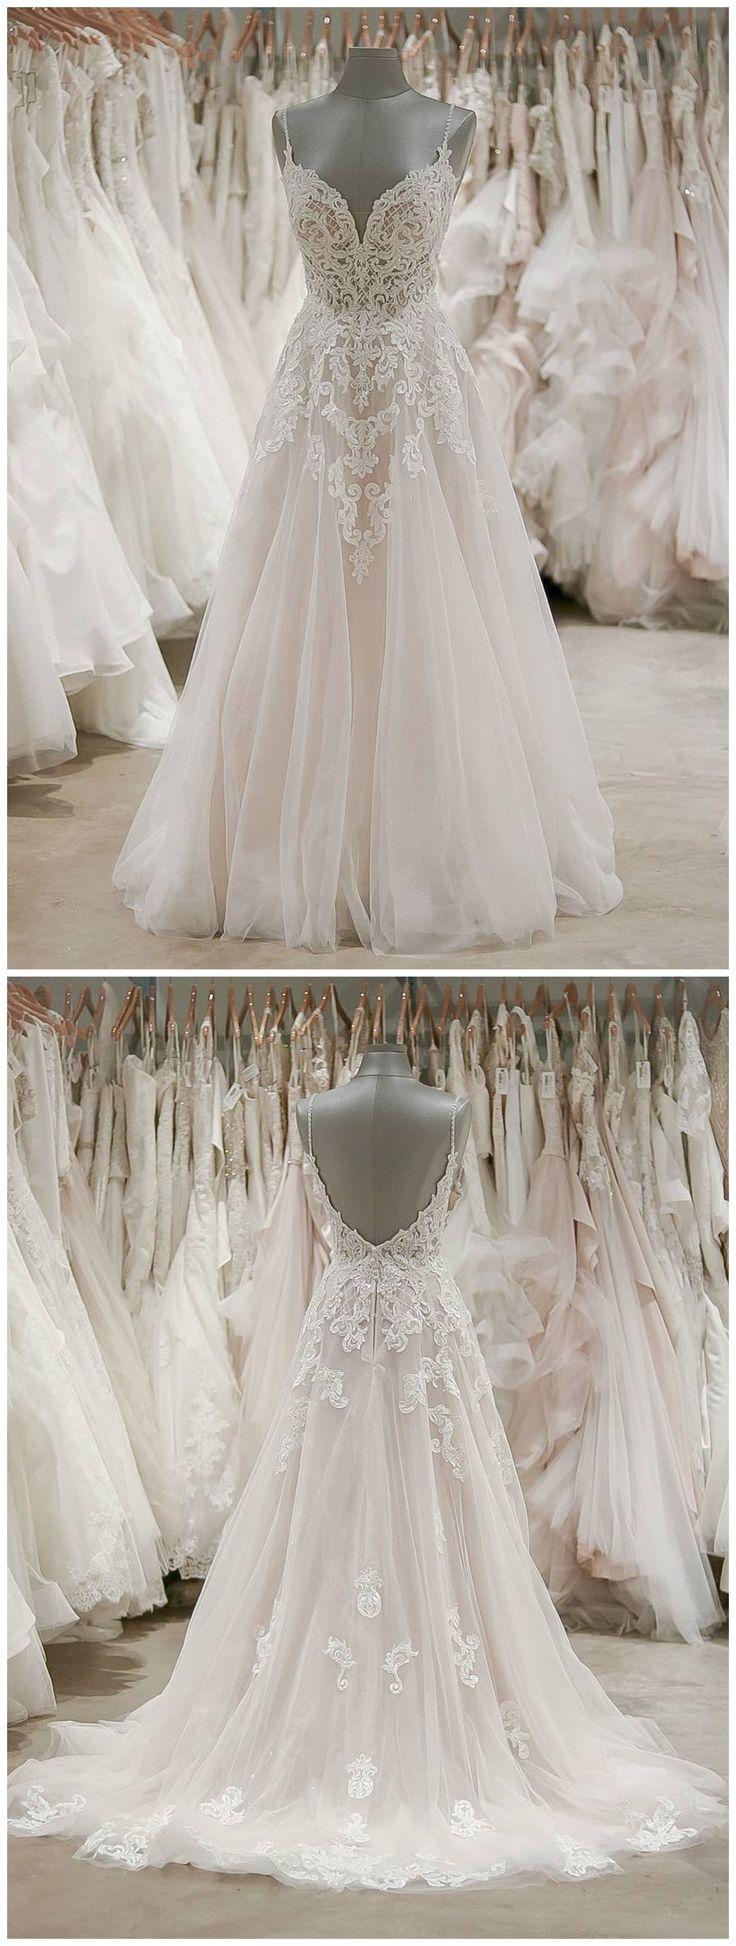 Spaghetti Strap V Neck Beach Wedding Dresses Beaded Bodice Wedding Dress AWD1180